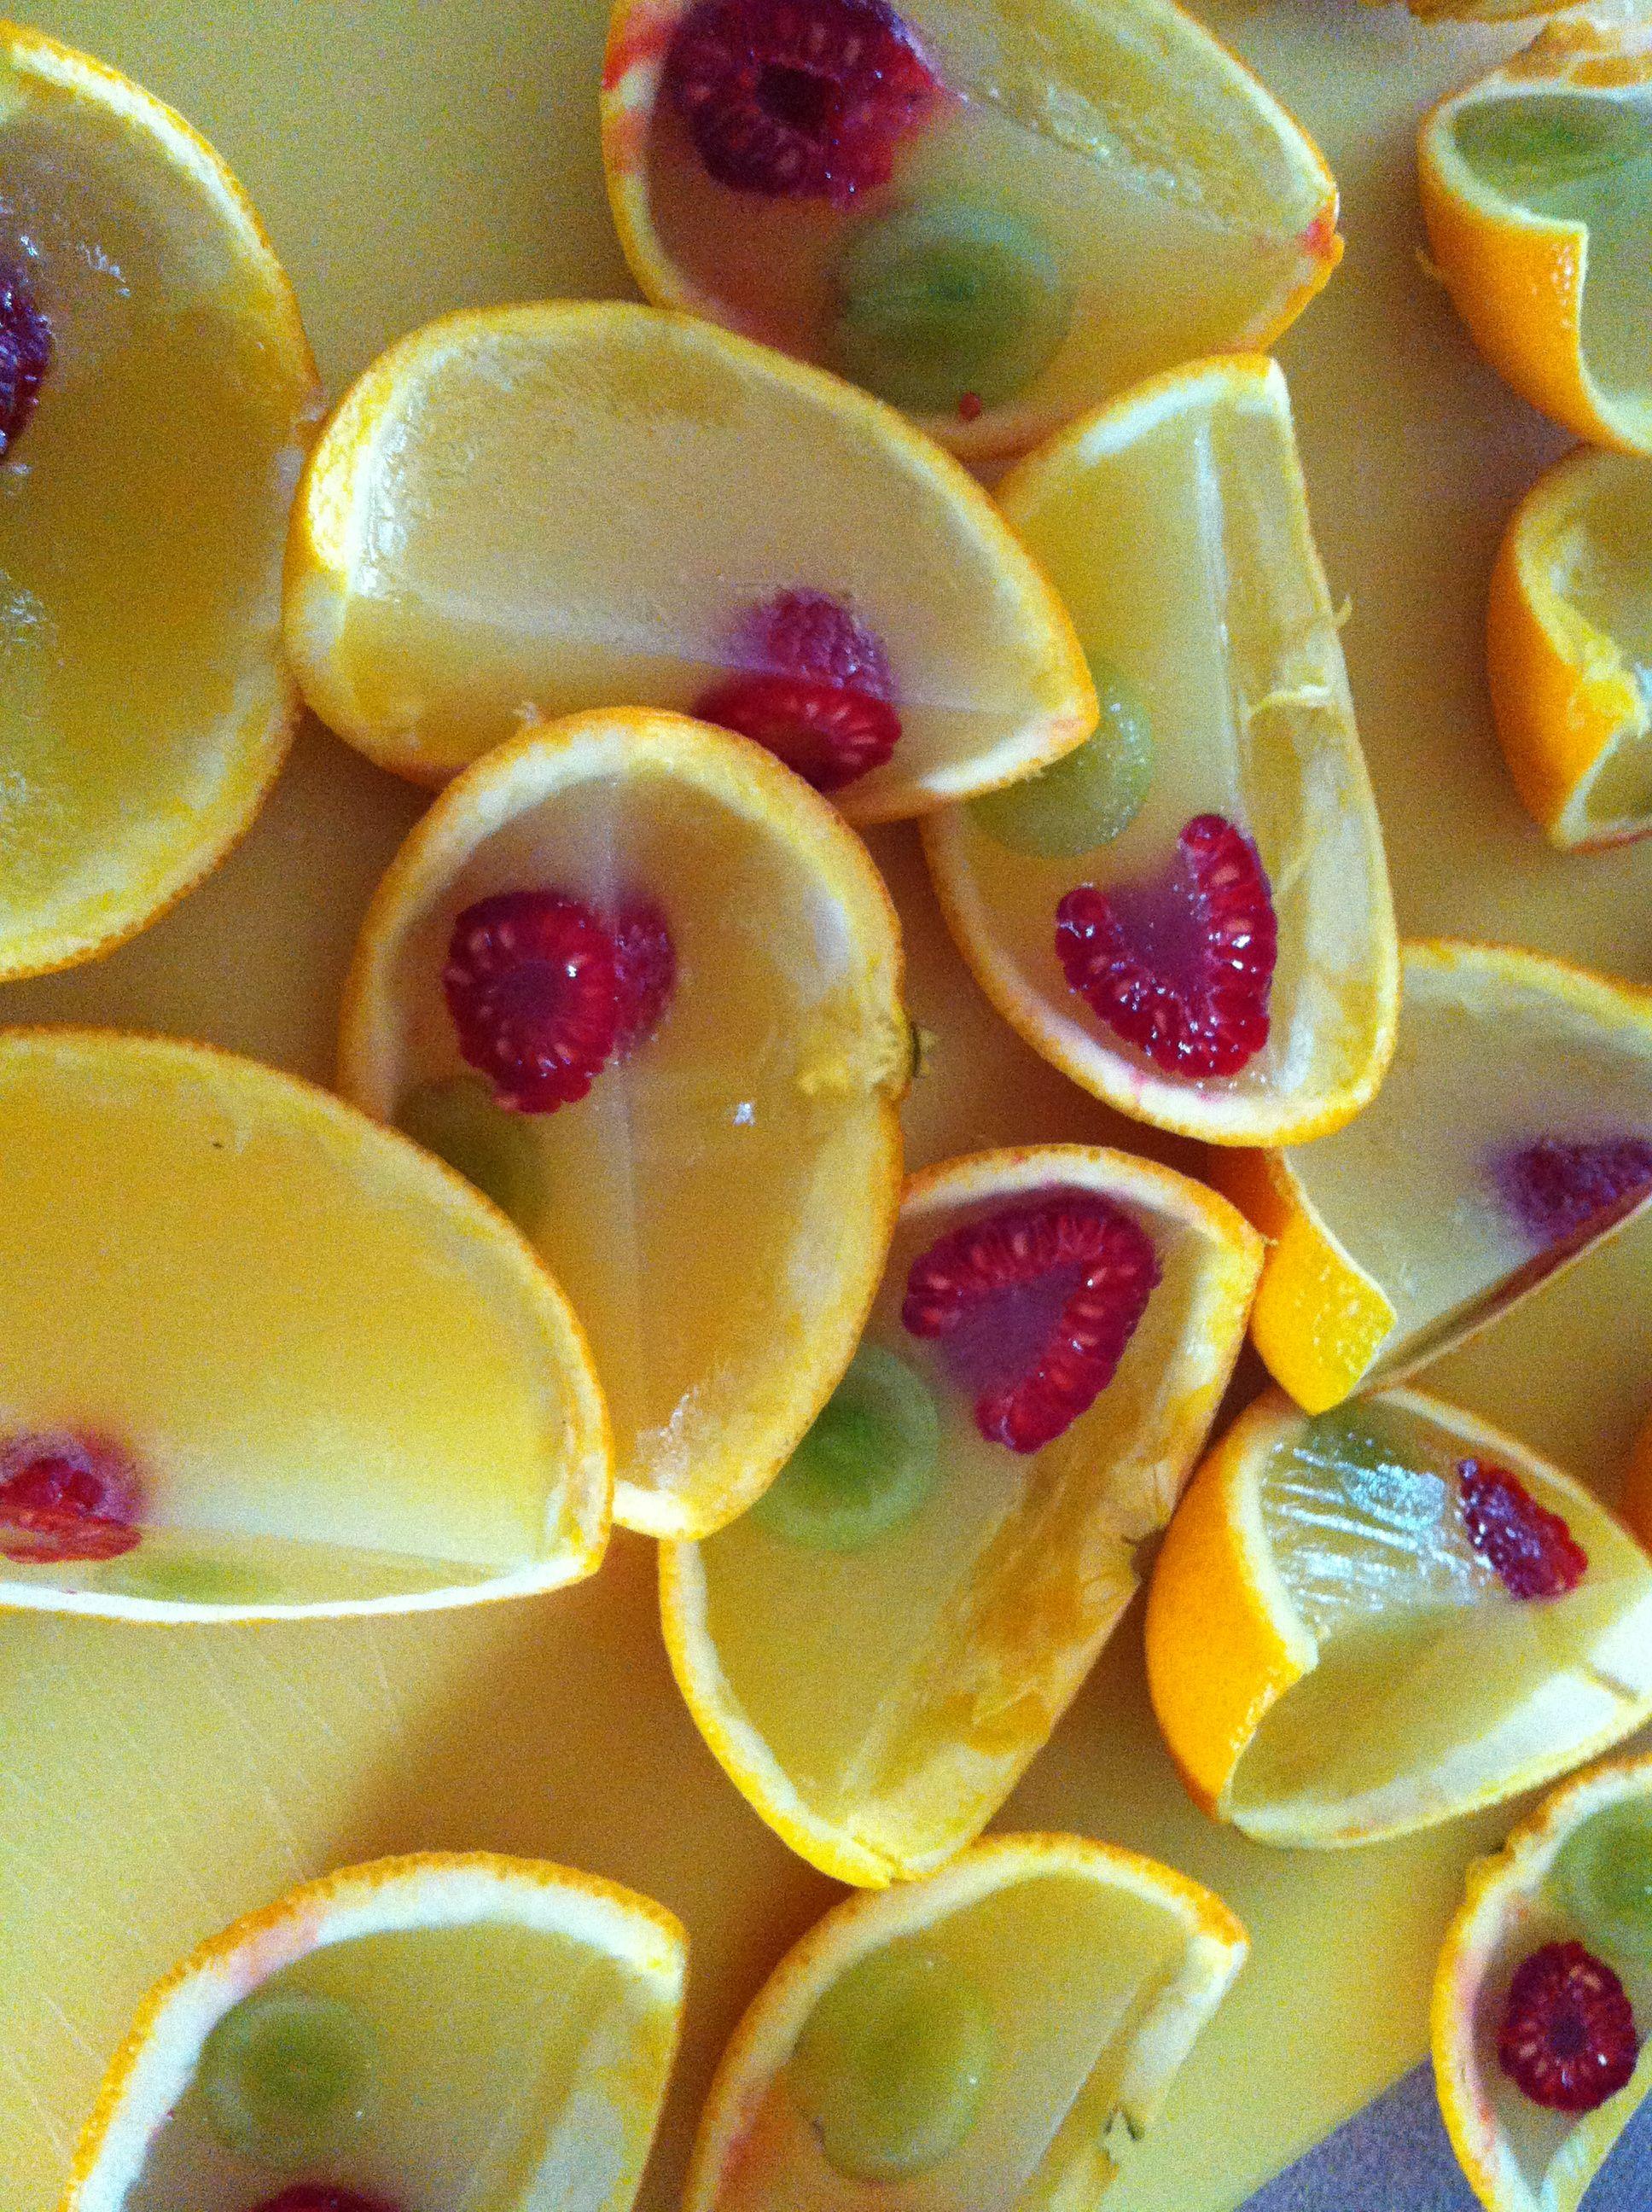 jello shots in orange peels Used this recipe for the jello shot ...